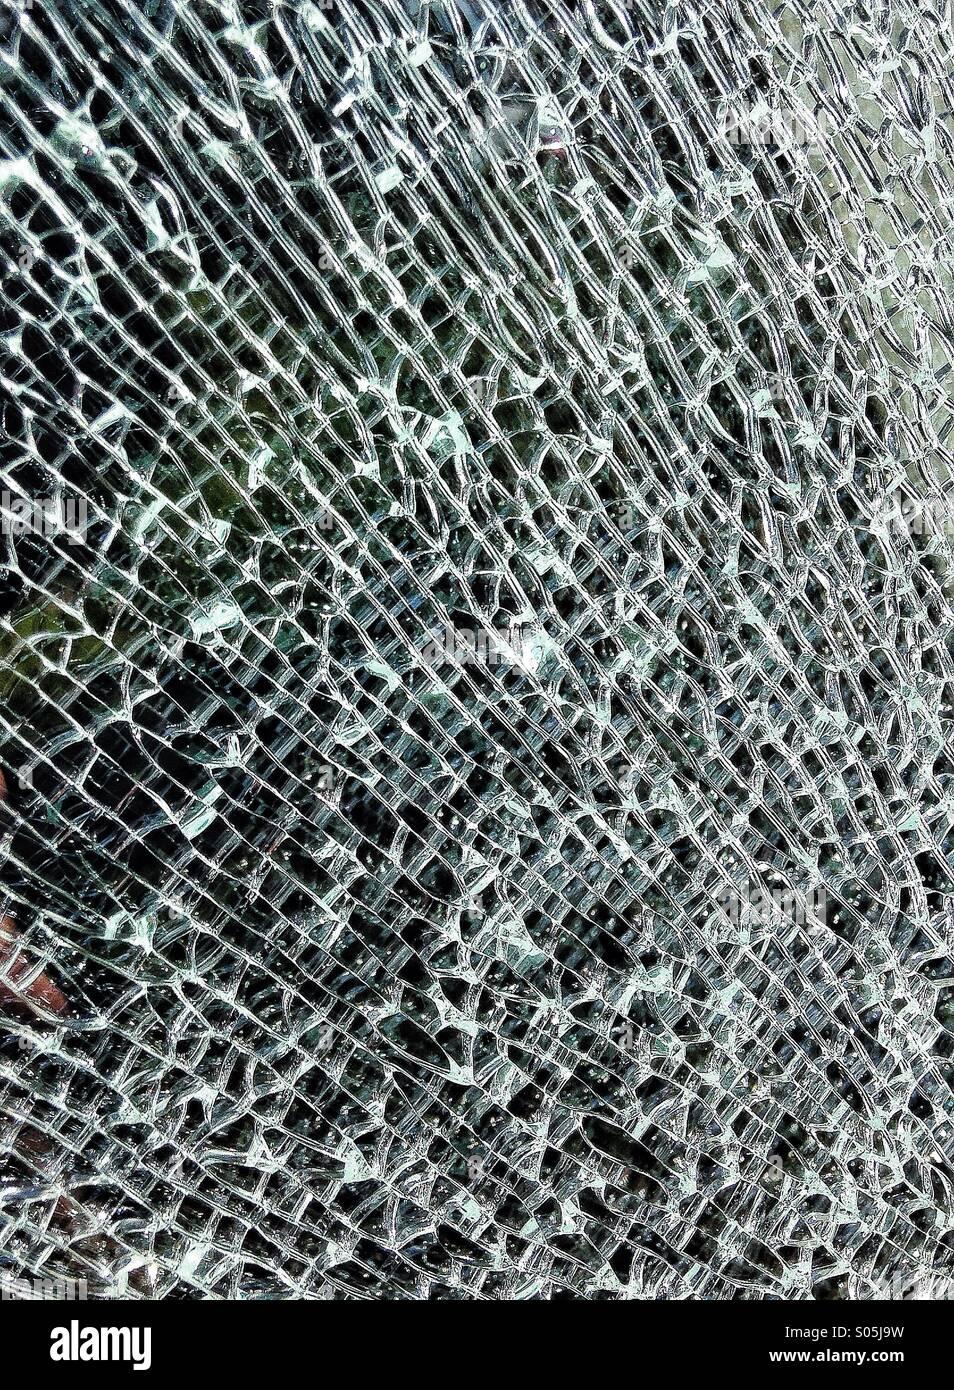 Zerschlagenen Glas Muster Stockbild